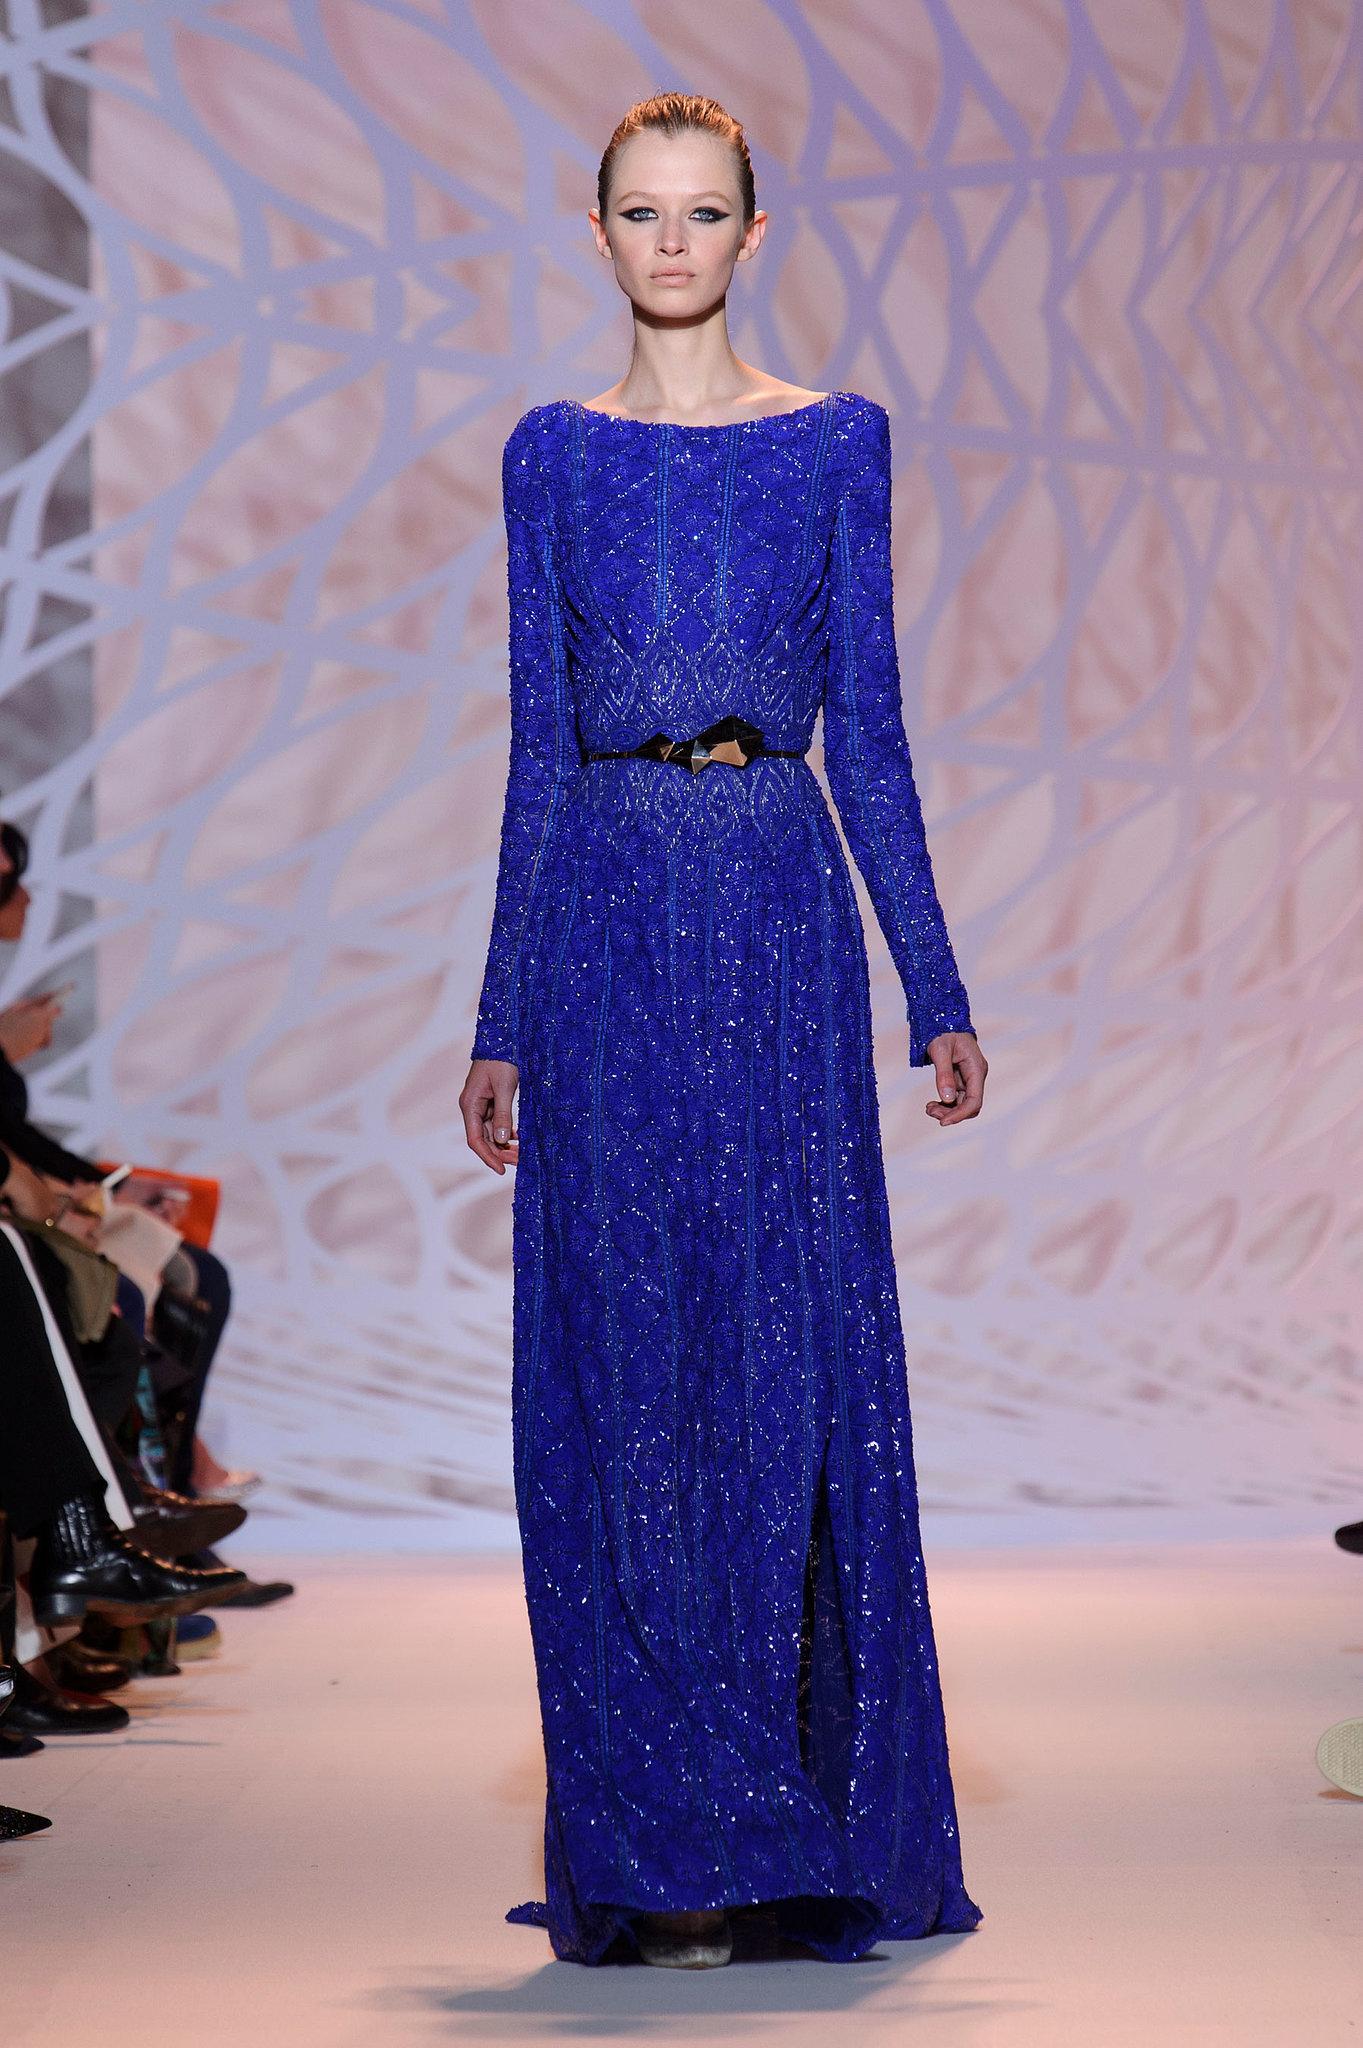 Zuhair-Murad-Haute-Couture-Fall-2014 (2)